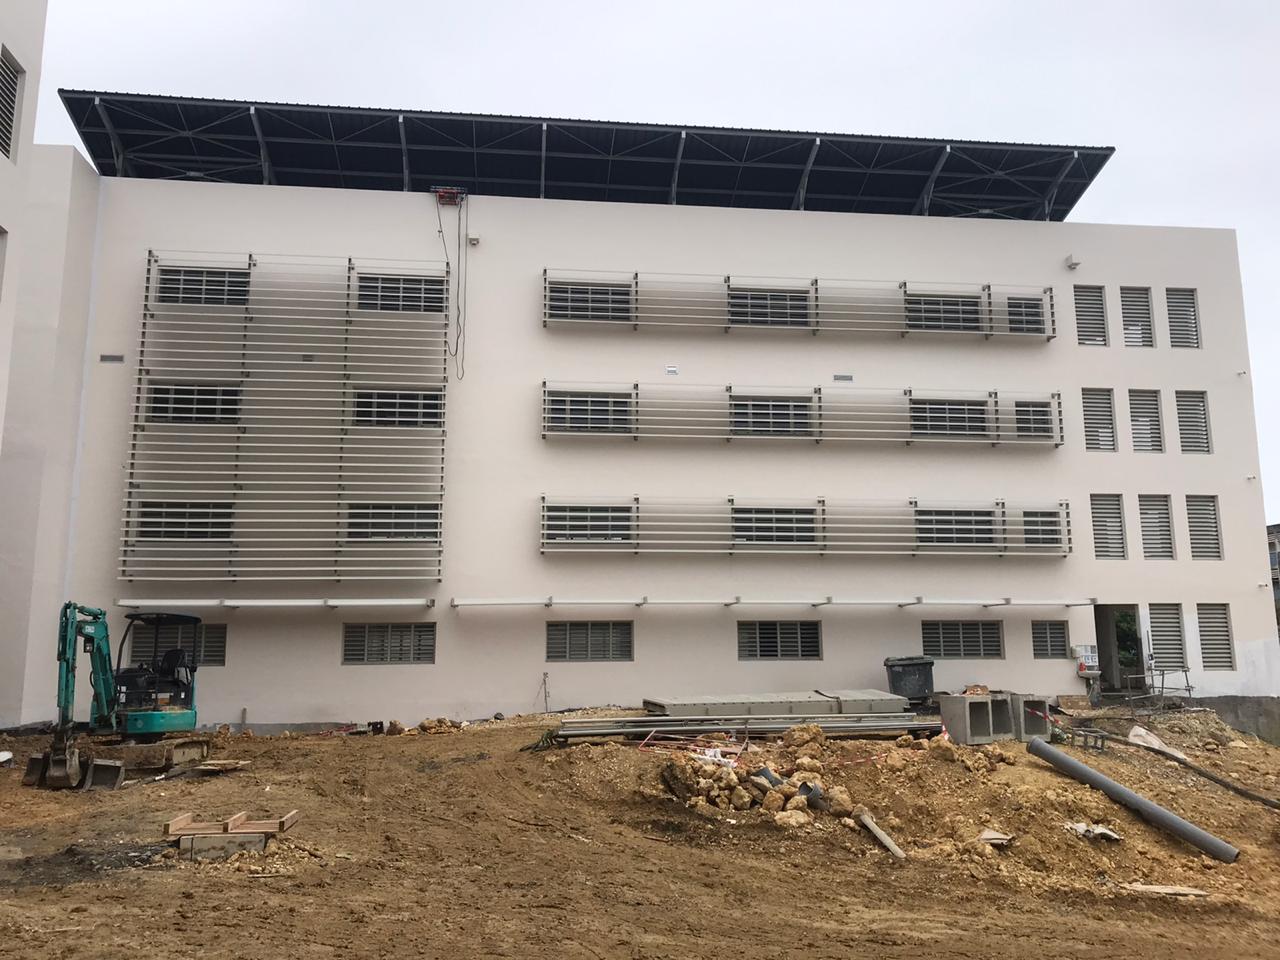 brise-soleil-aluminium-protection-solaire-pluie-lames-tubulaires-ventilation-aeration